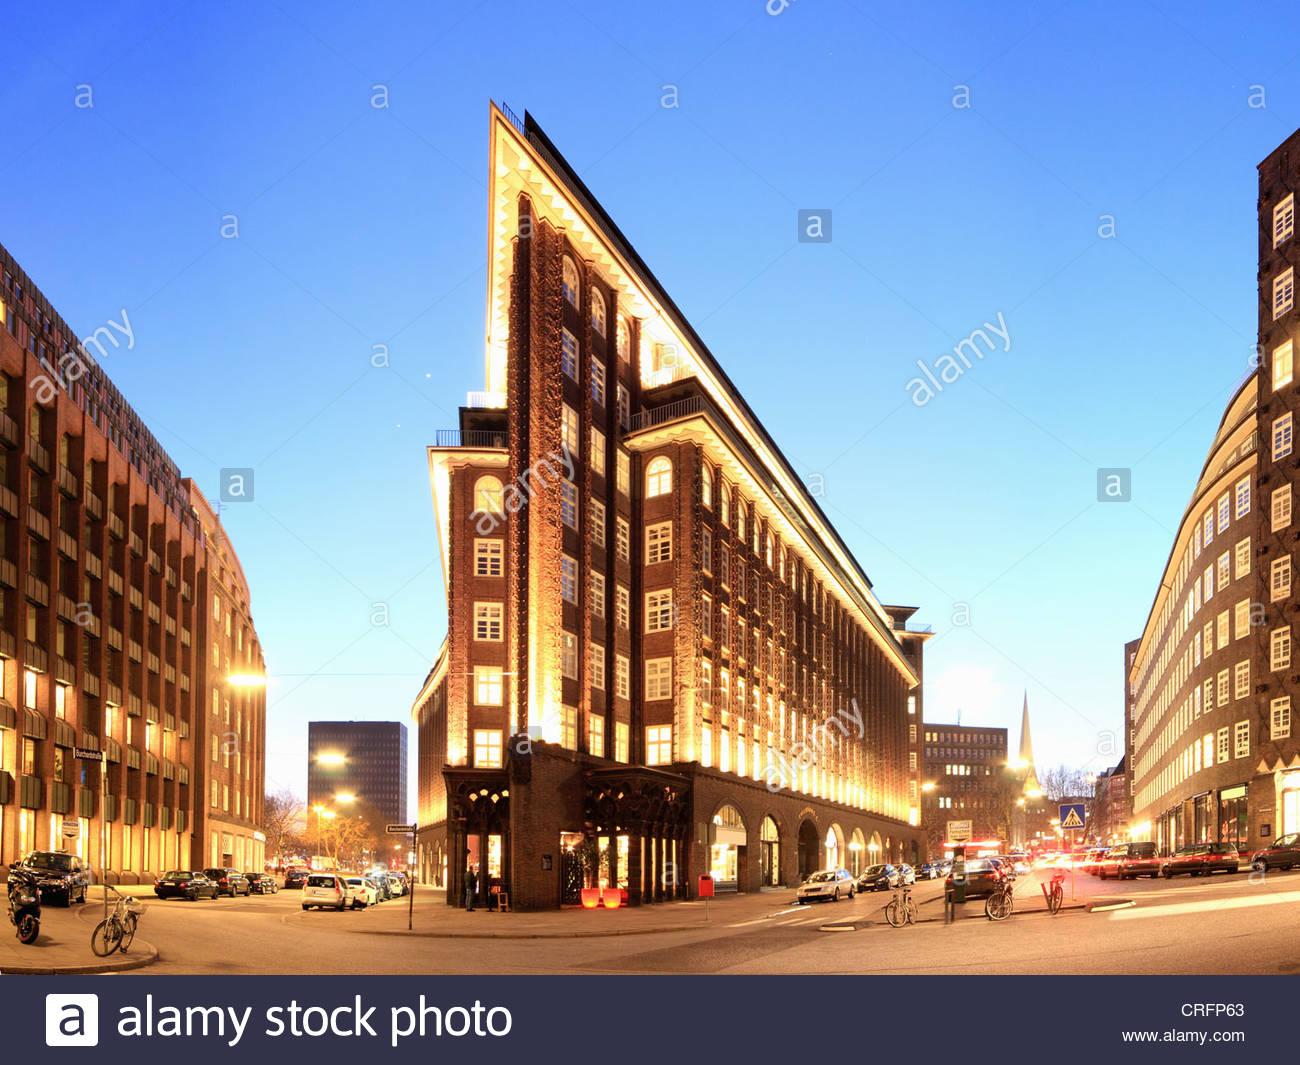 Lit buildings in Hamburg at night - Stock Image